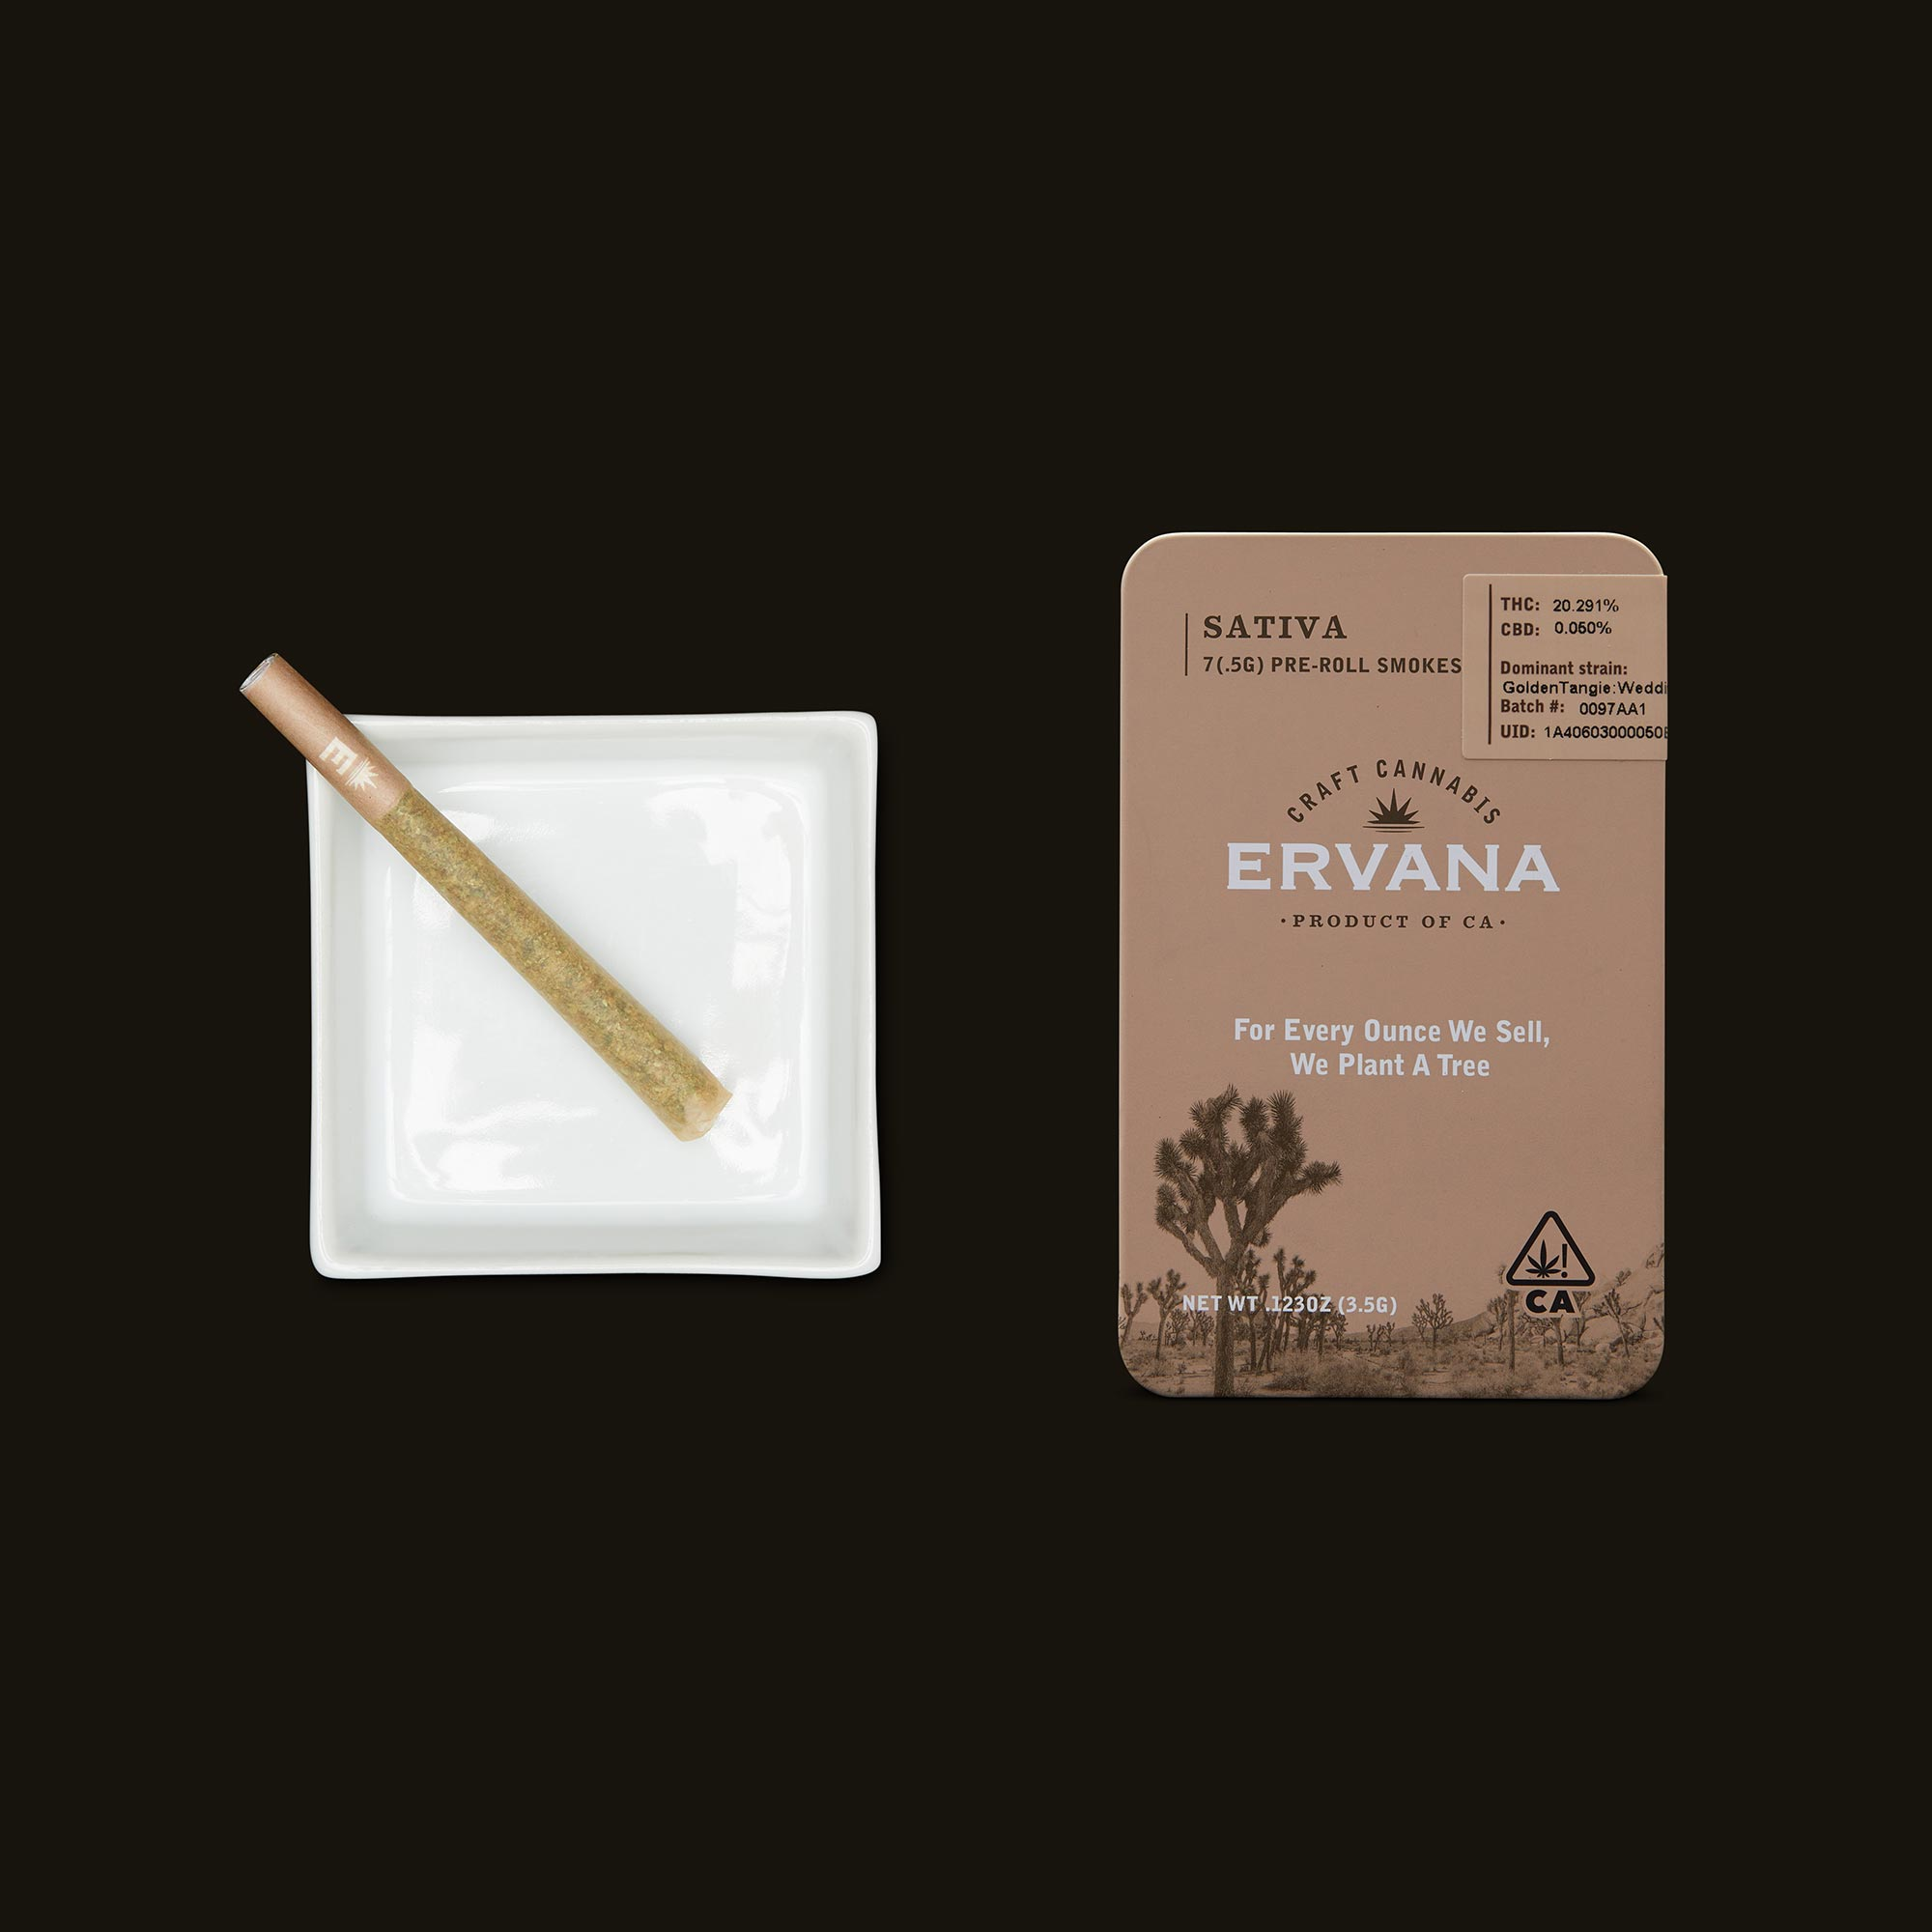 Ervana Sativa Pre-Rolls